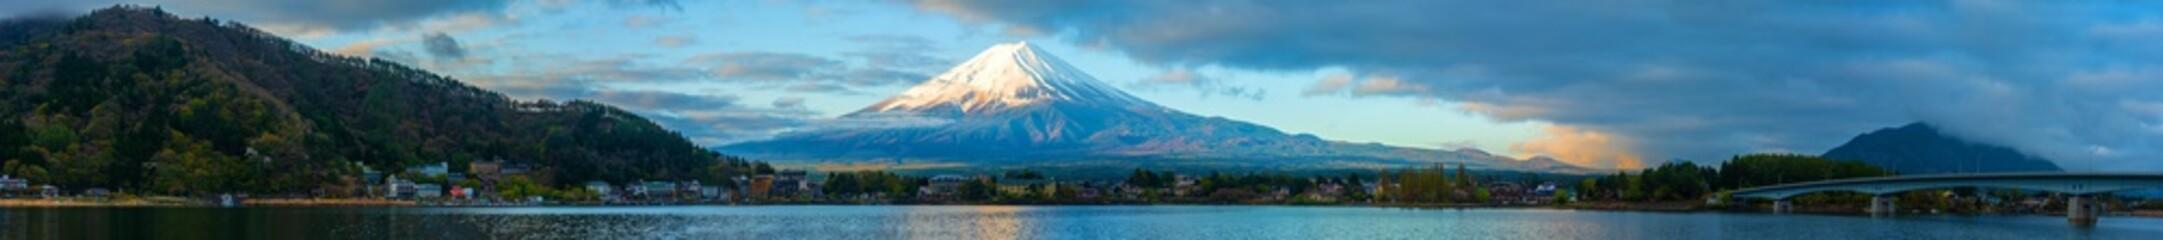 Panorama image of Mount Fuji and Lake.